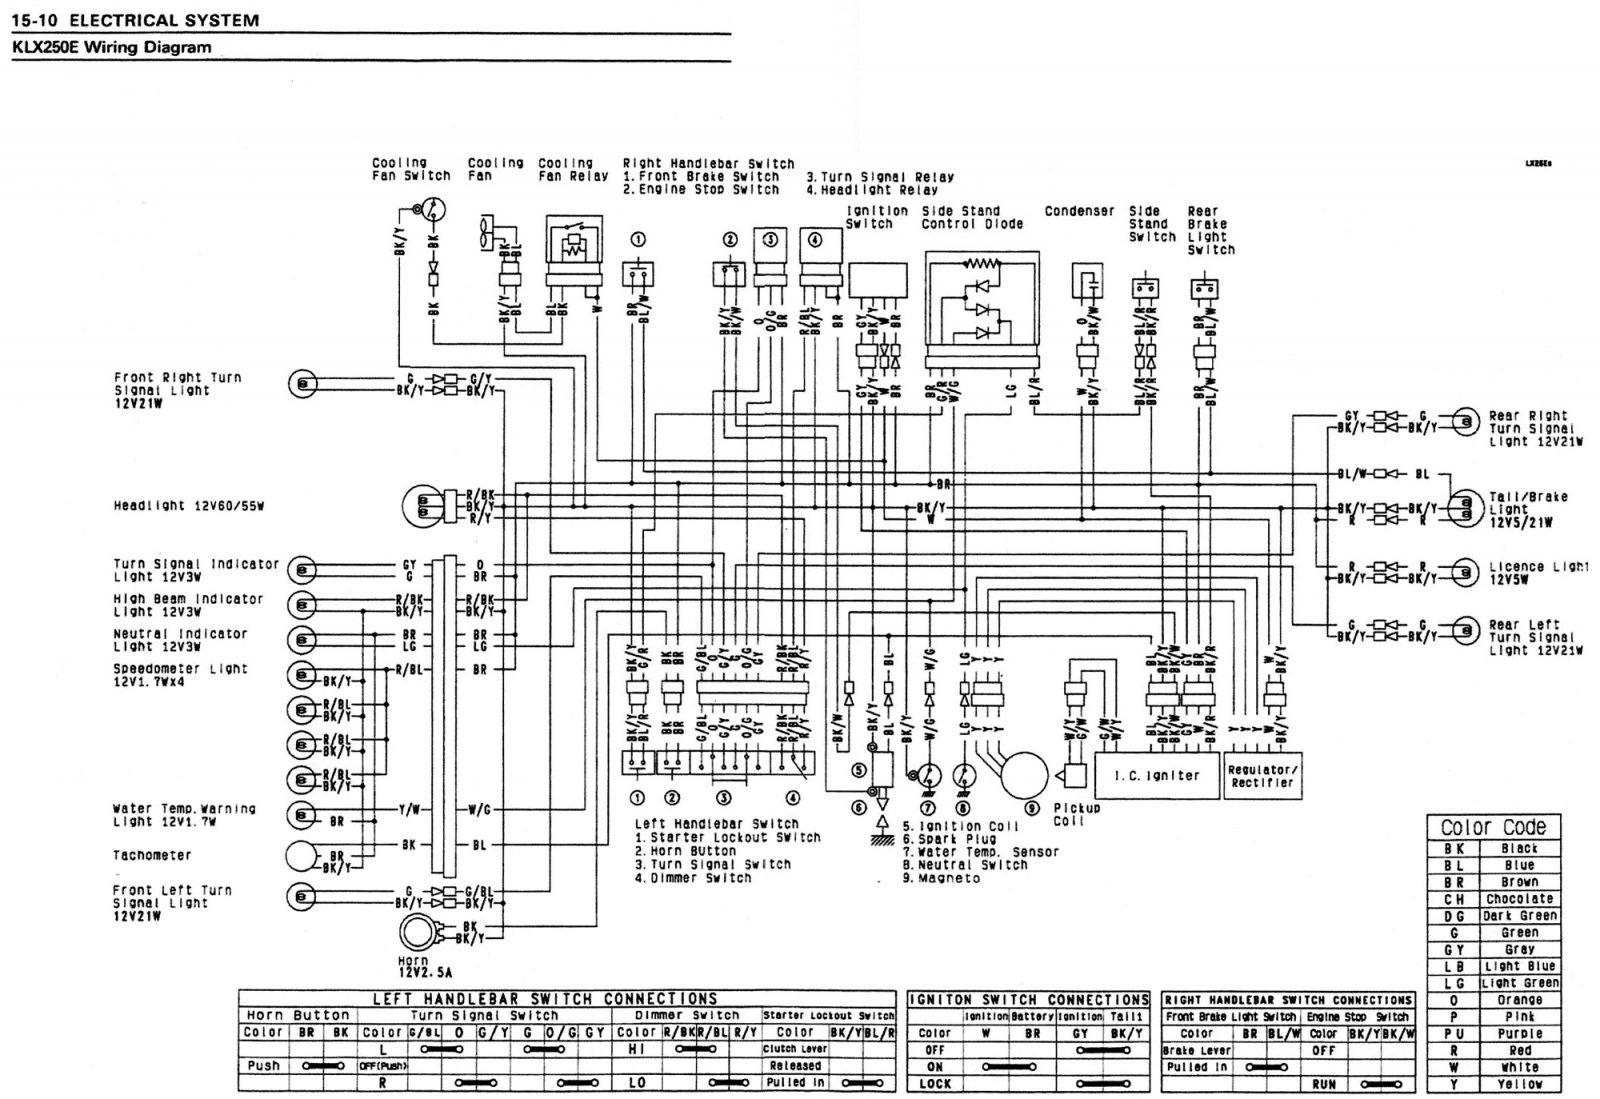 hight resolution of kawasaki klf 400 wiring diagram wiring library kawasaki kfx 50 kawasaki klf 400 wiring diagram